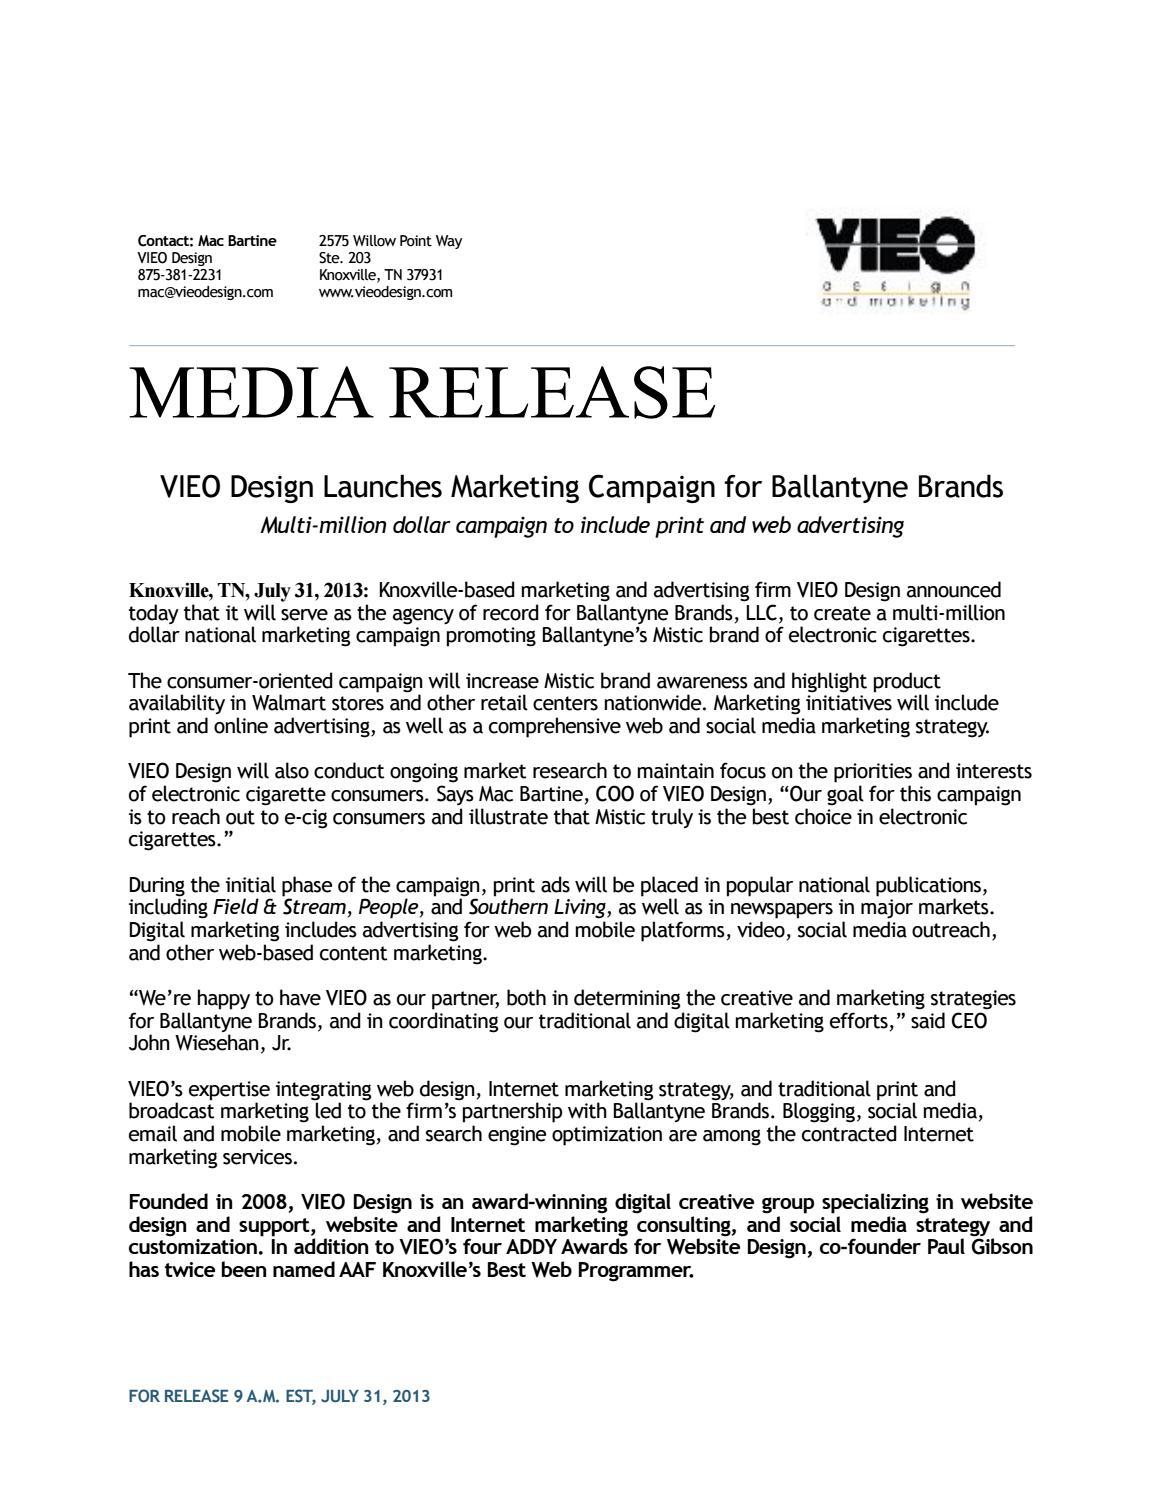 VIEO-Ballantyne Brands Media Release by Emily Winsauer - issuu